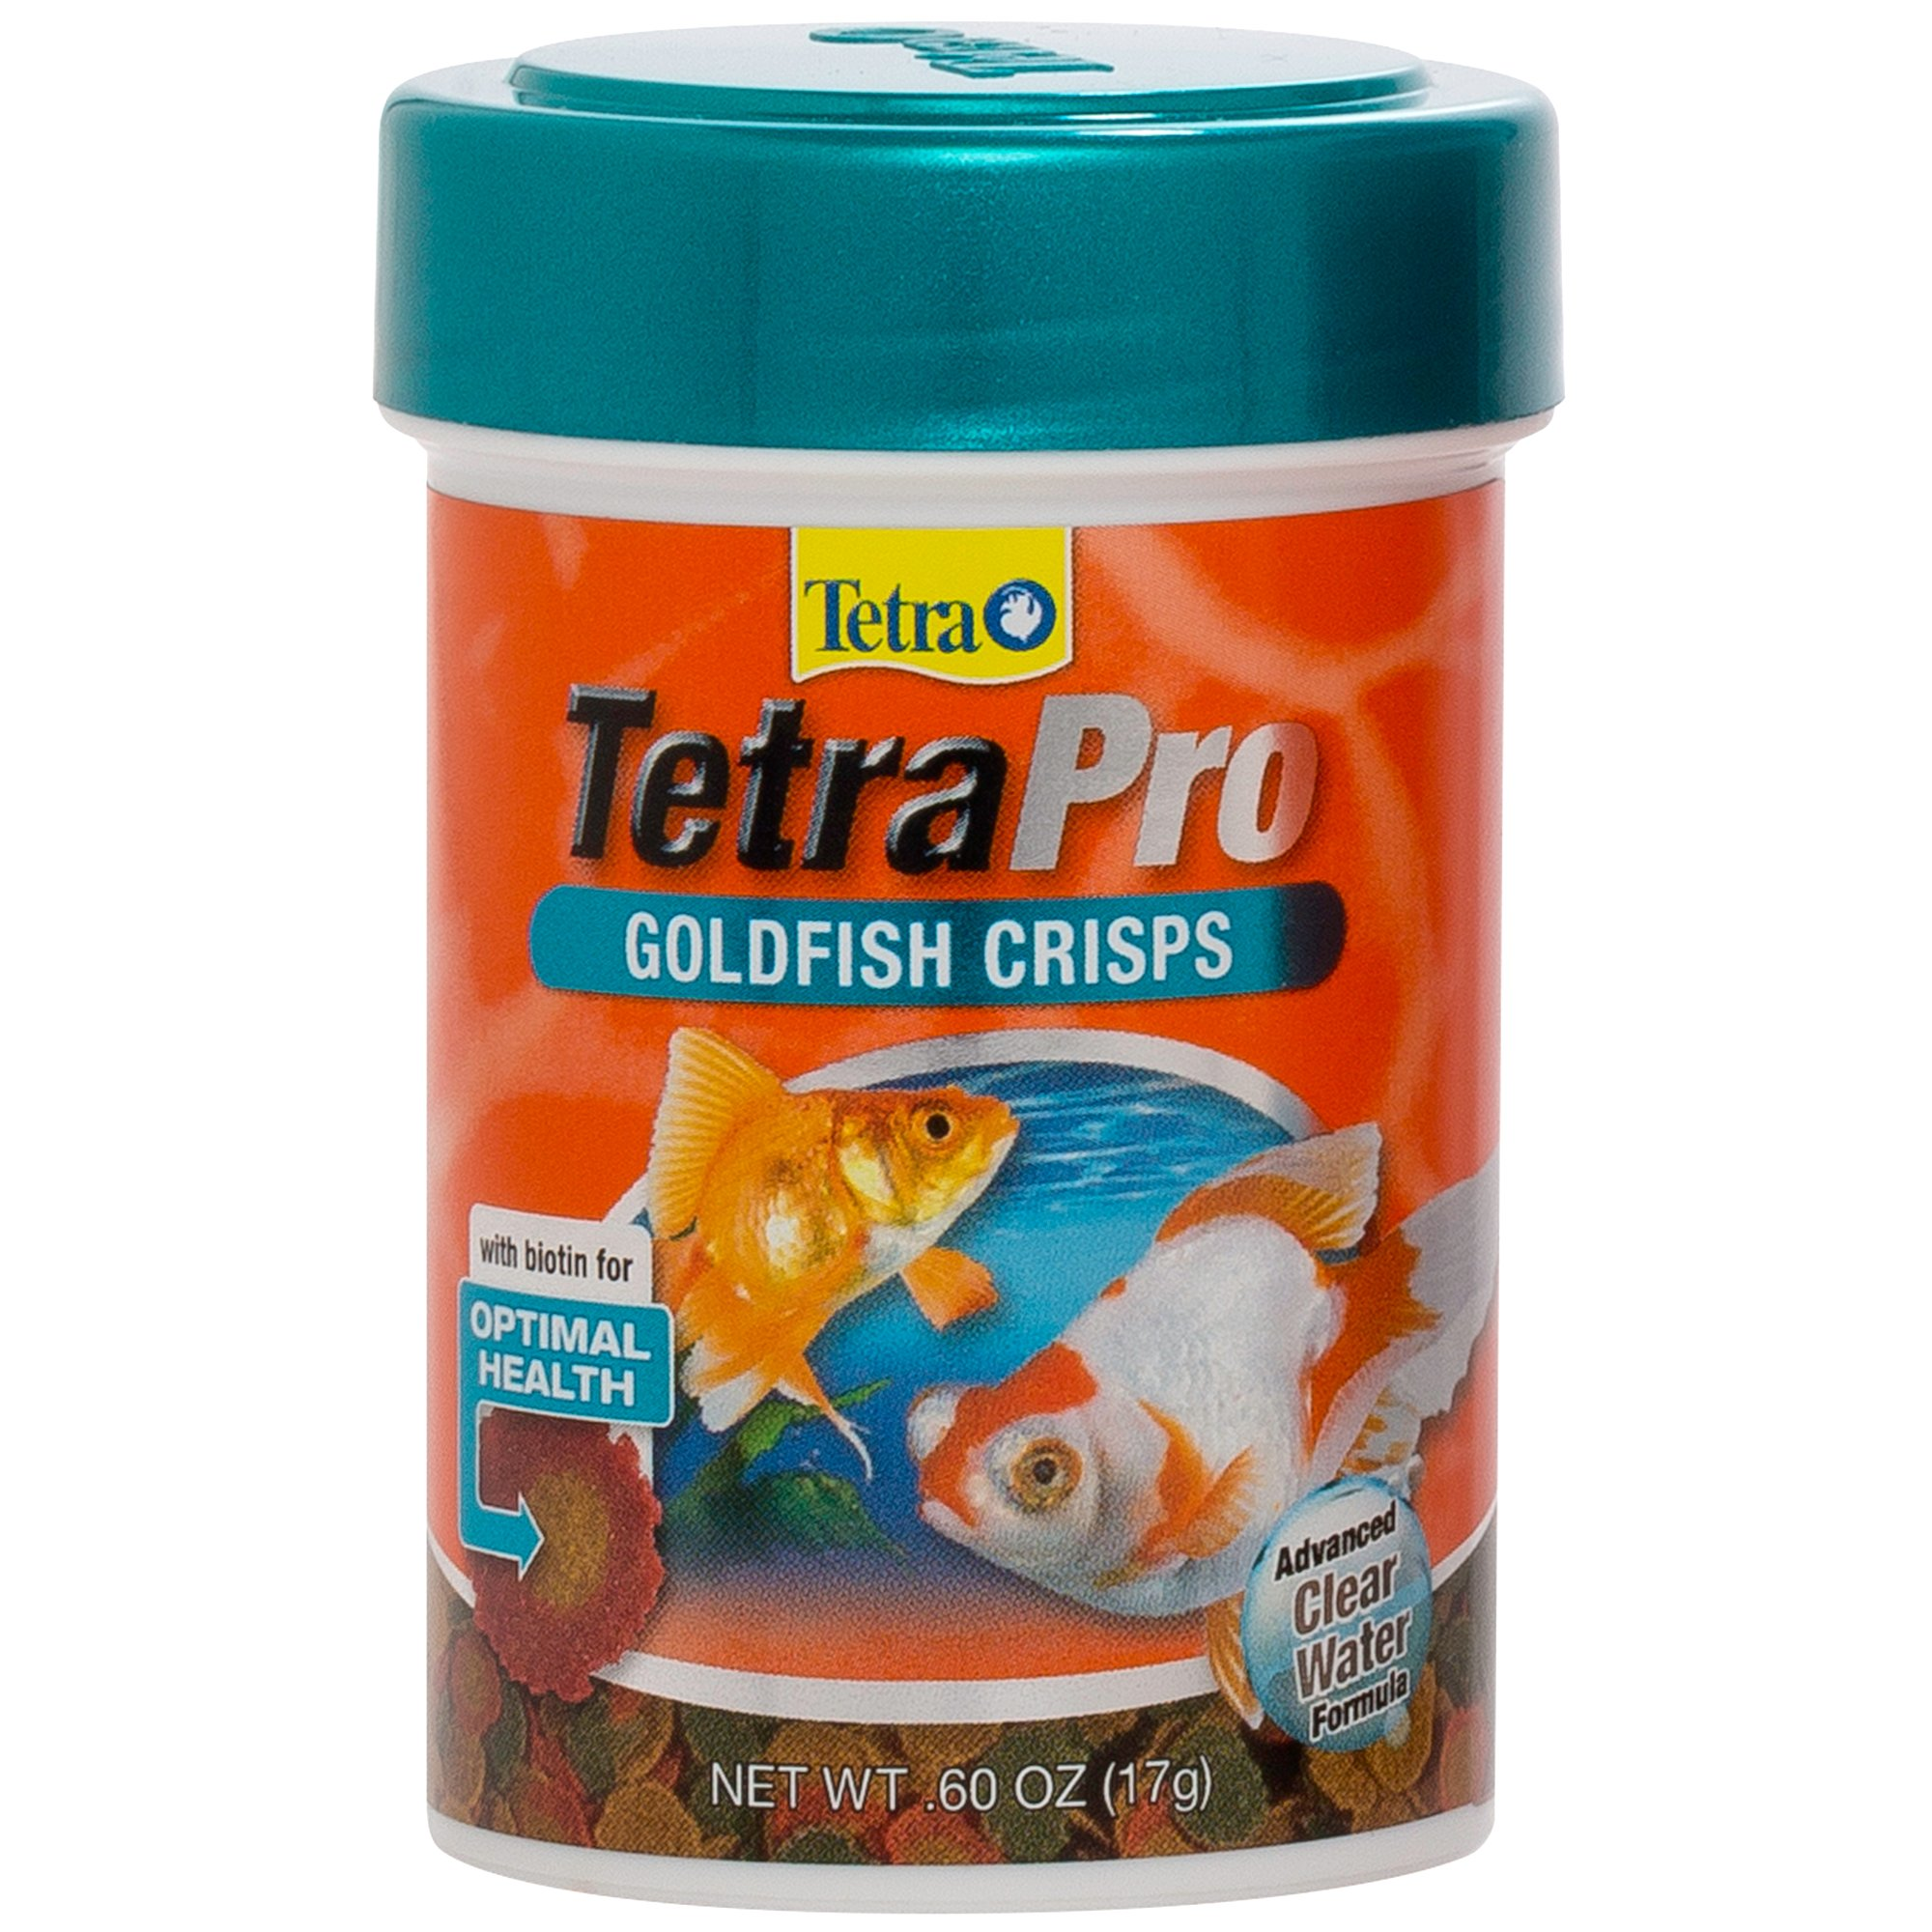 Tetra pro goldfish food 6 oz petco for Petco fish food